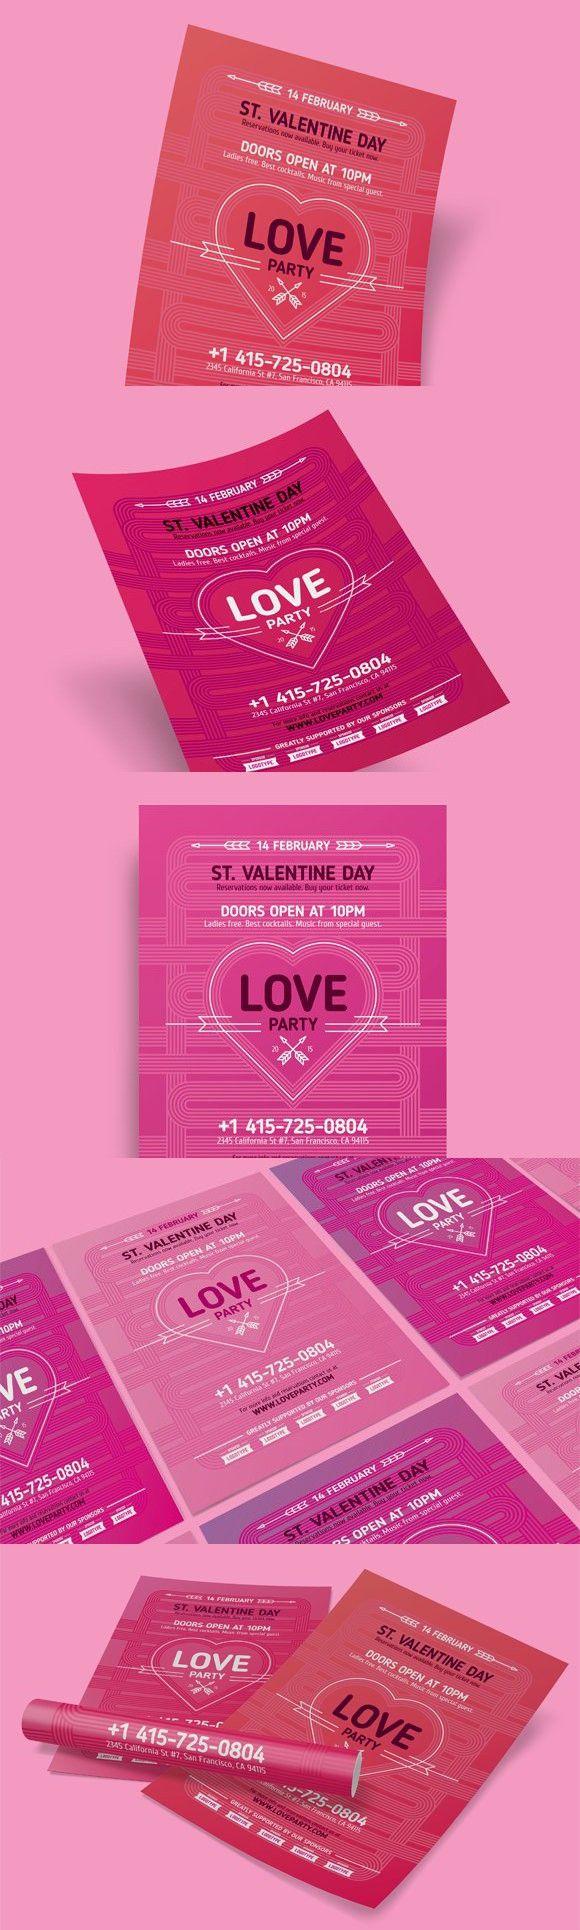 Valentine's Day Poster, Vol.4